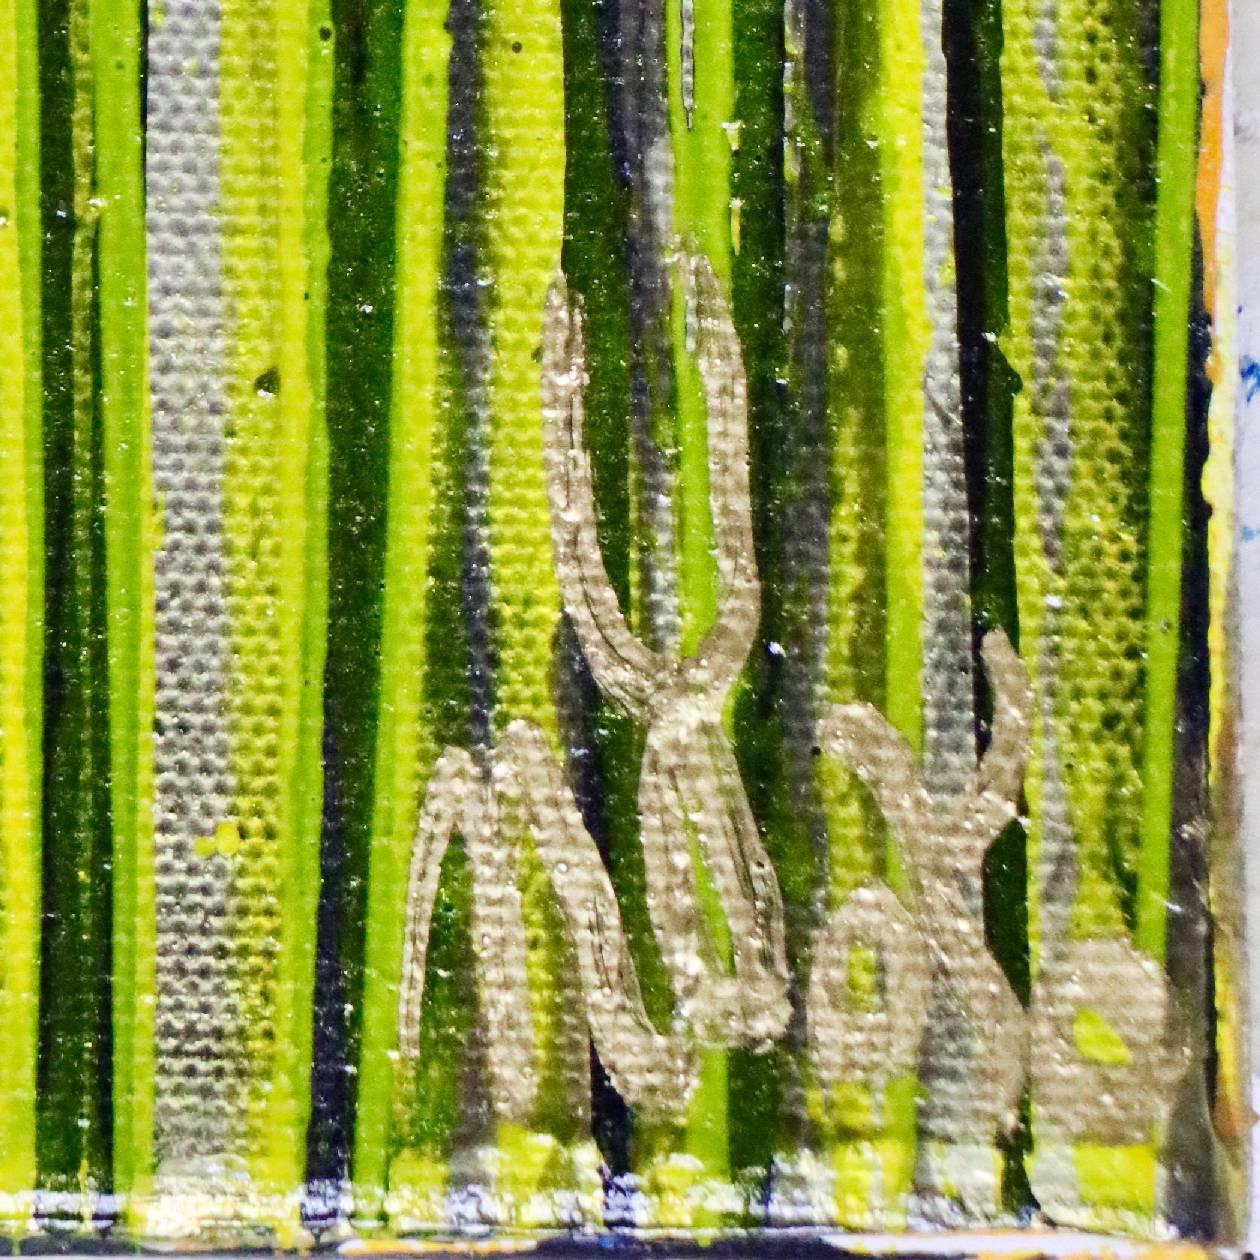 Signature - Daydream Panorama (Natures Imagery) 17 (2020) - Triptych by Nestor Toro